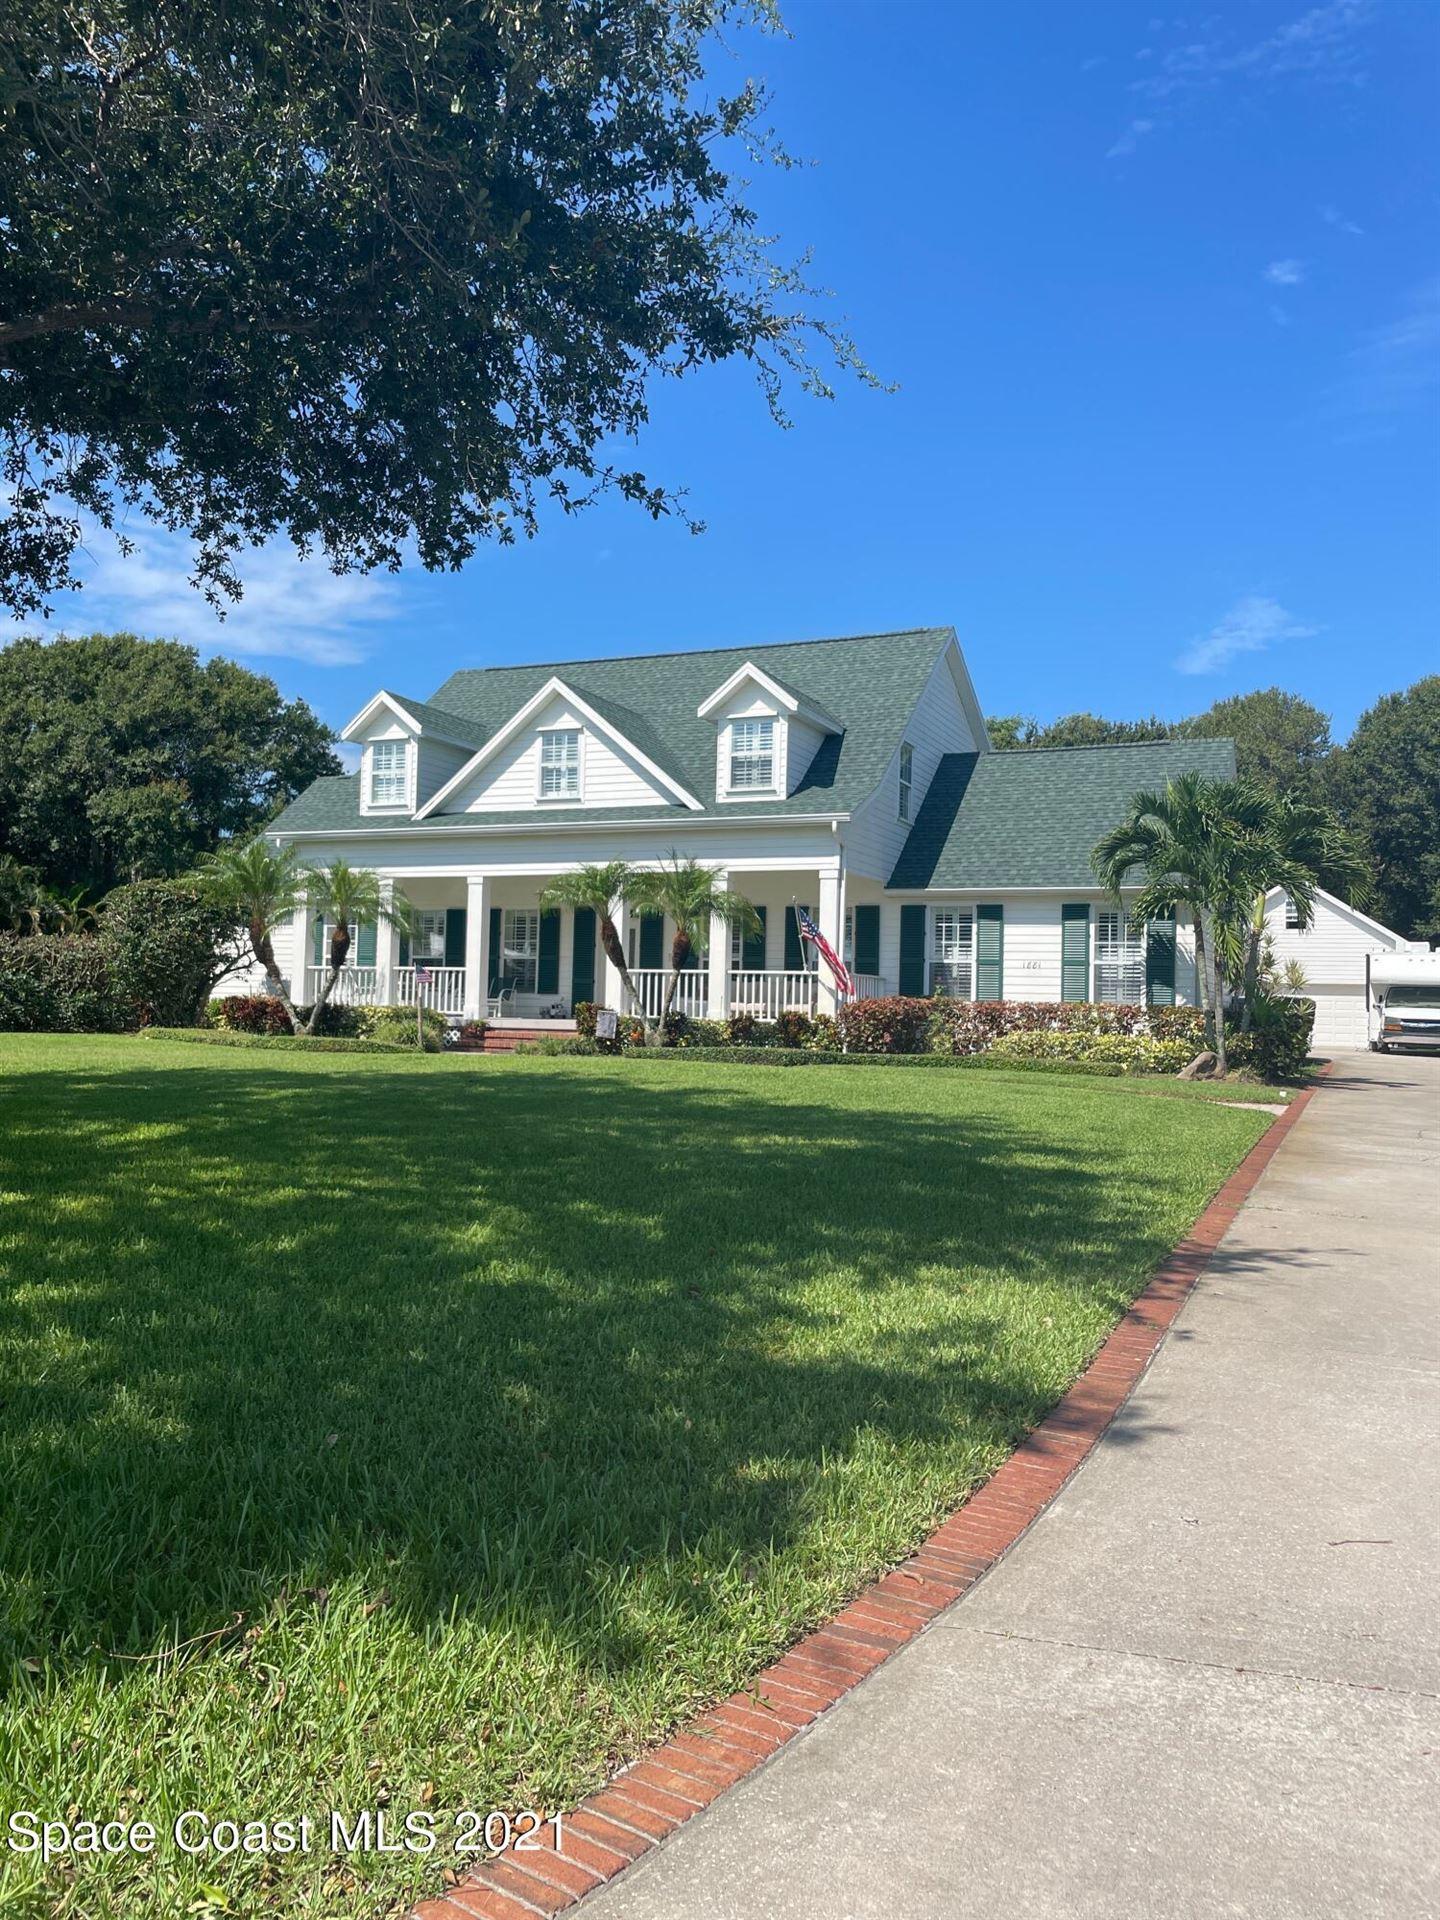 1881 Rockledge Drive, Rockledge, FL 32955 - #: 914058